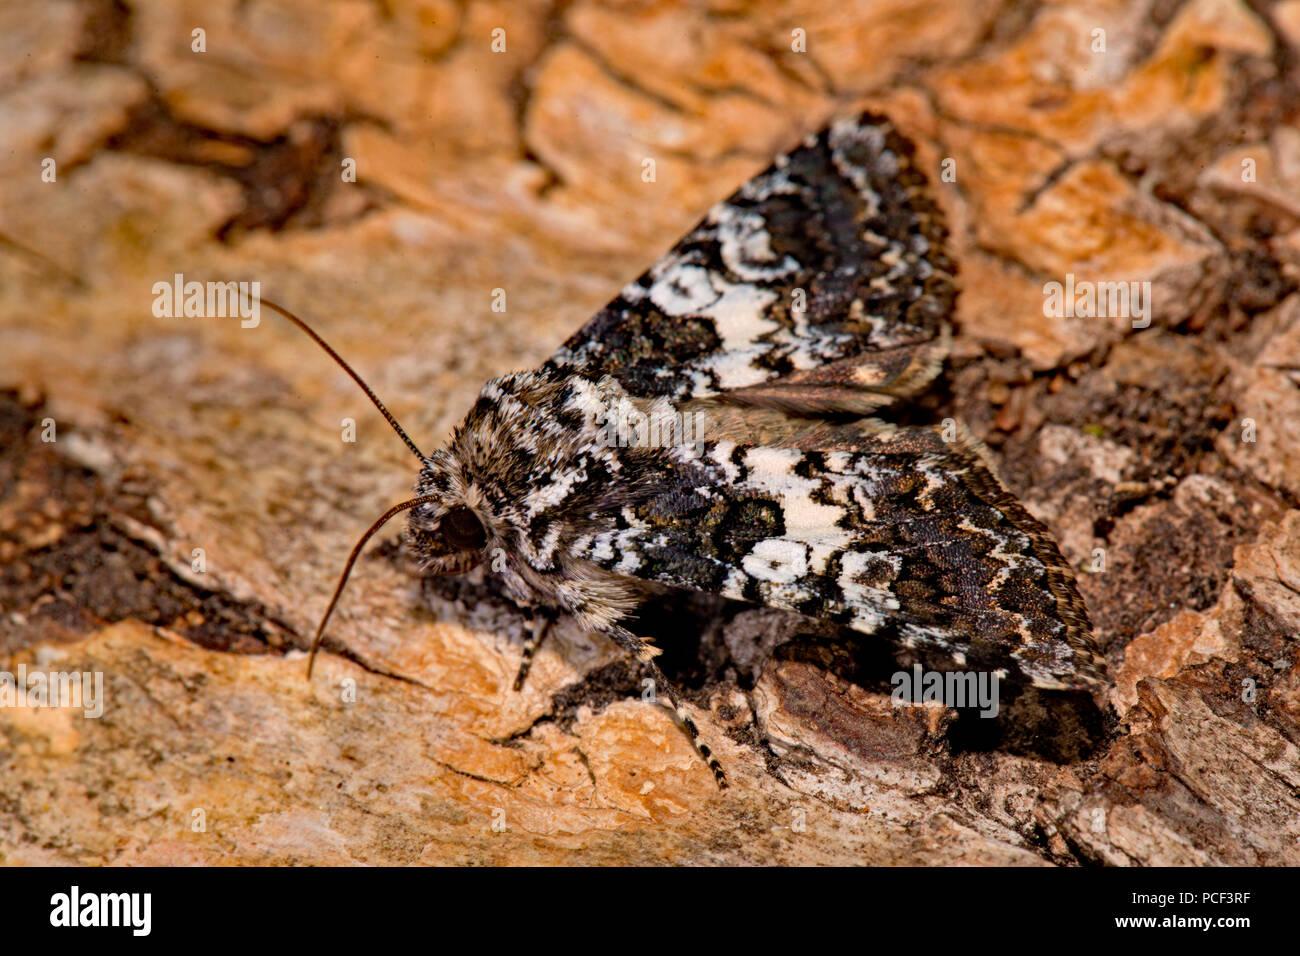 varied coronet moth, (Hadena compta) - Stock Image